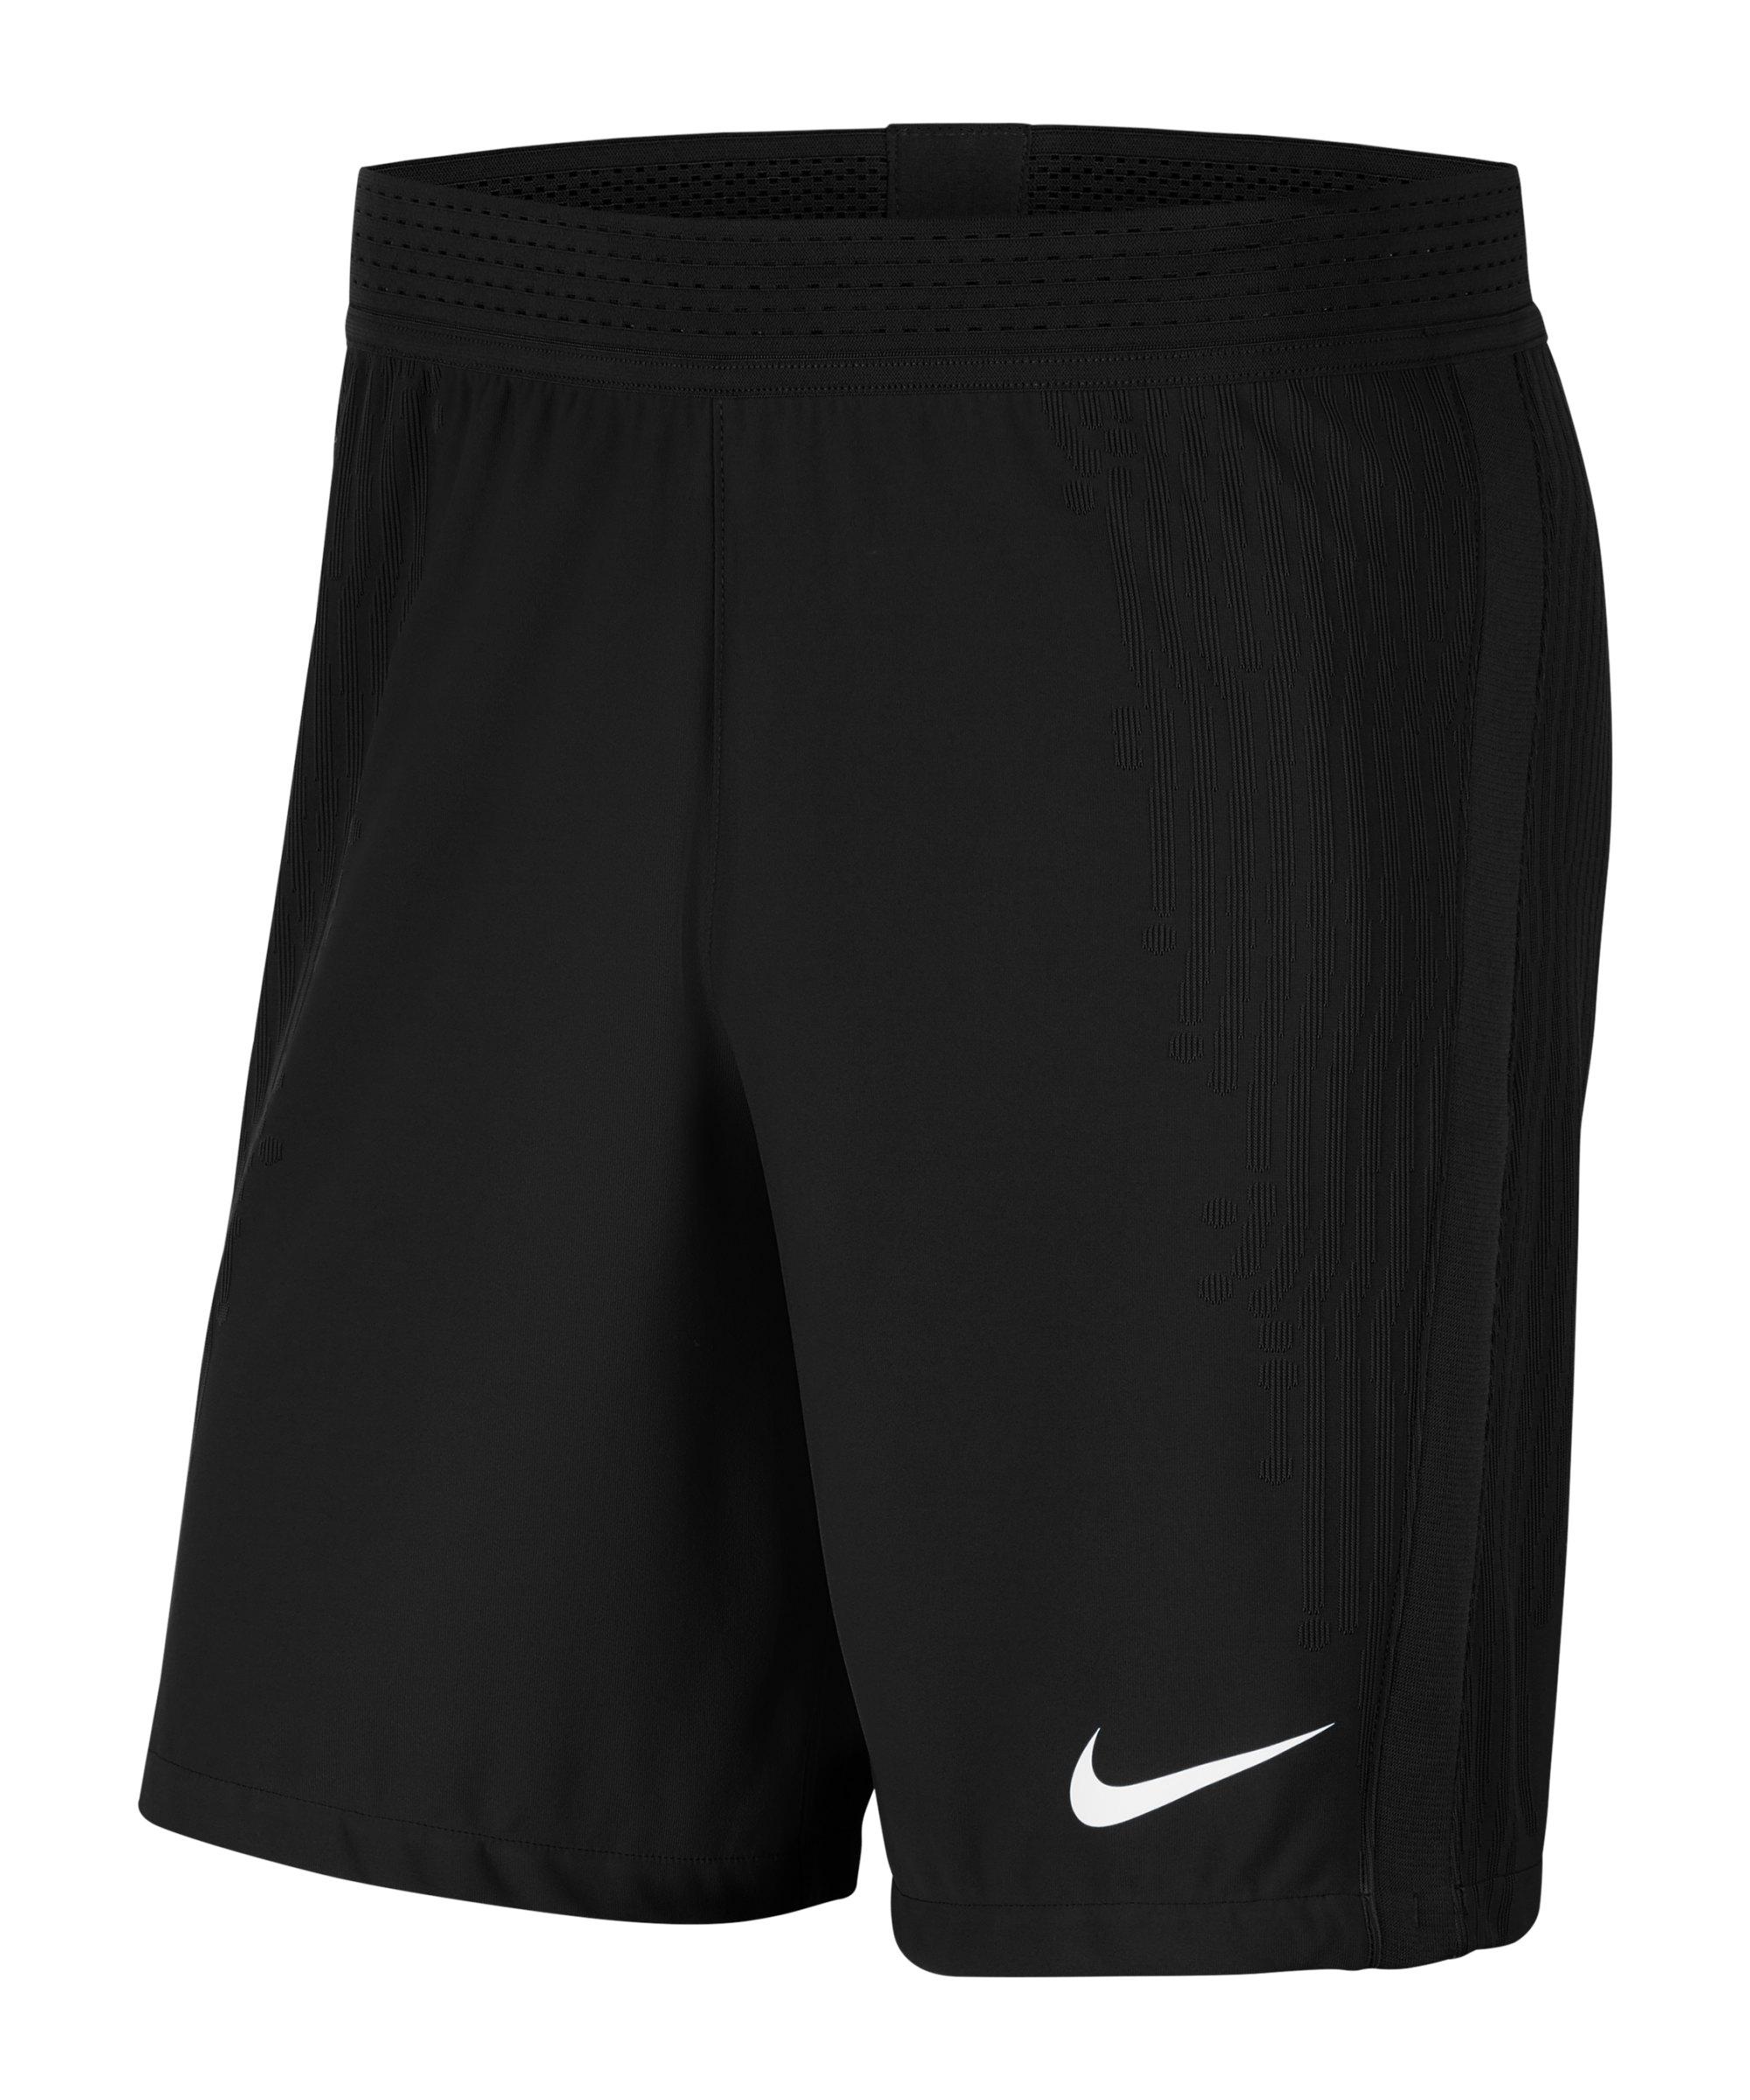 Nike Vaporknit III Short Schwarz Weiss F010 - schwarz